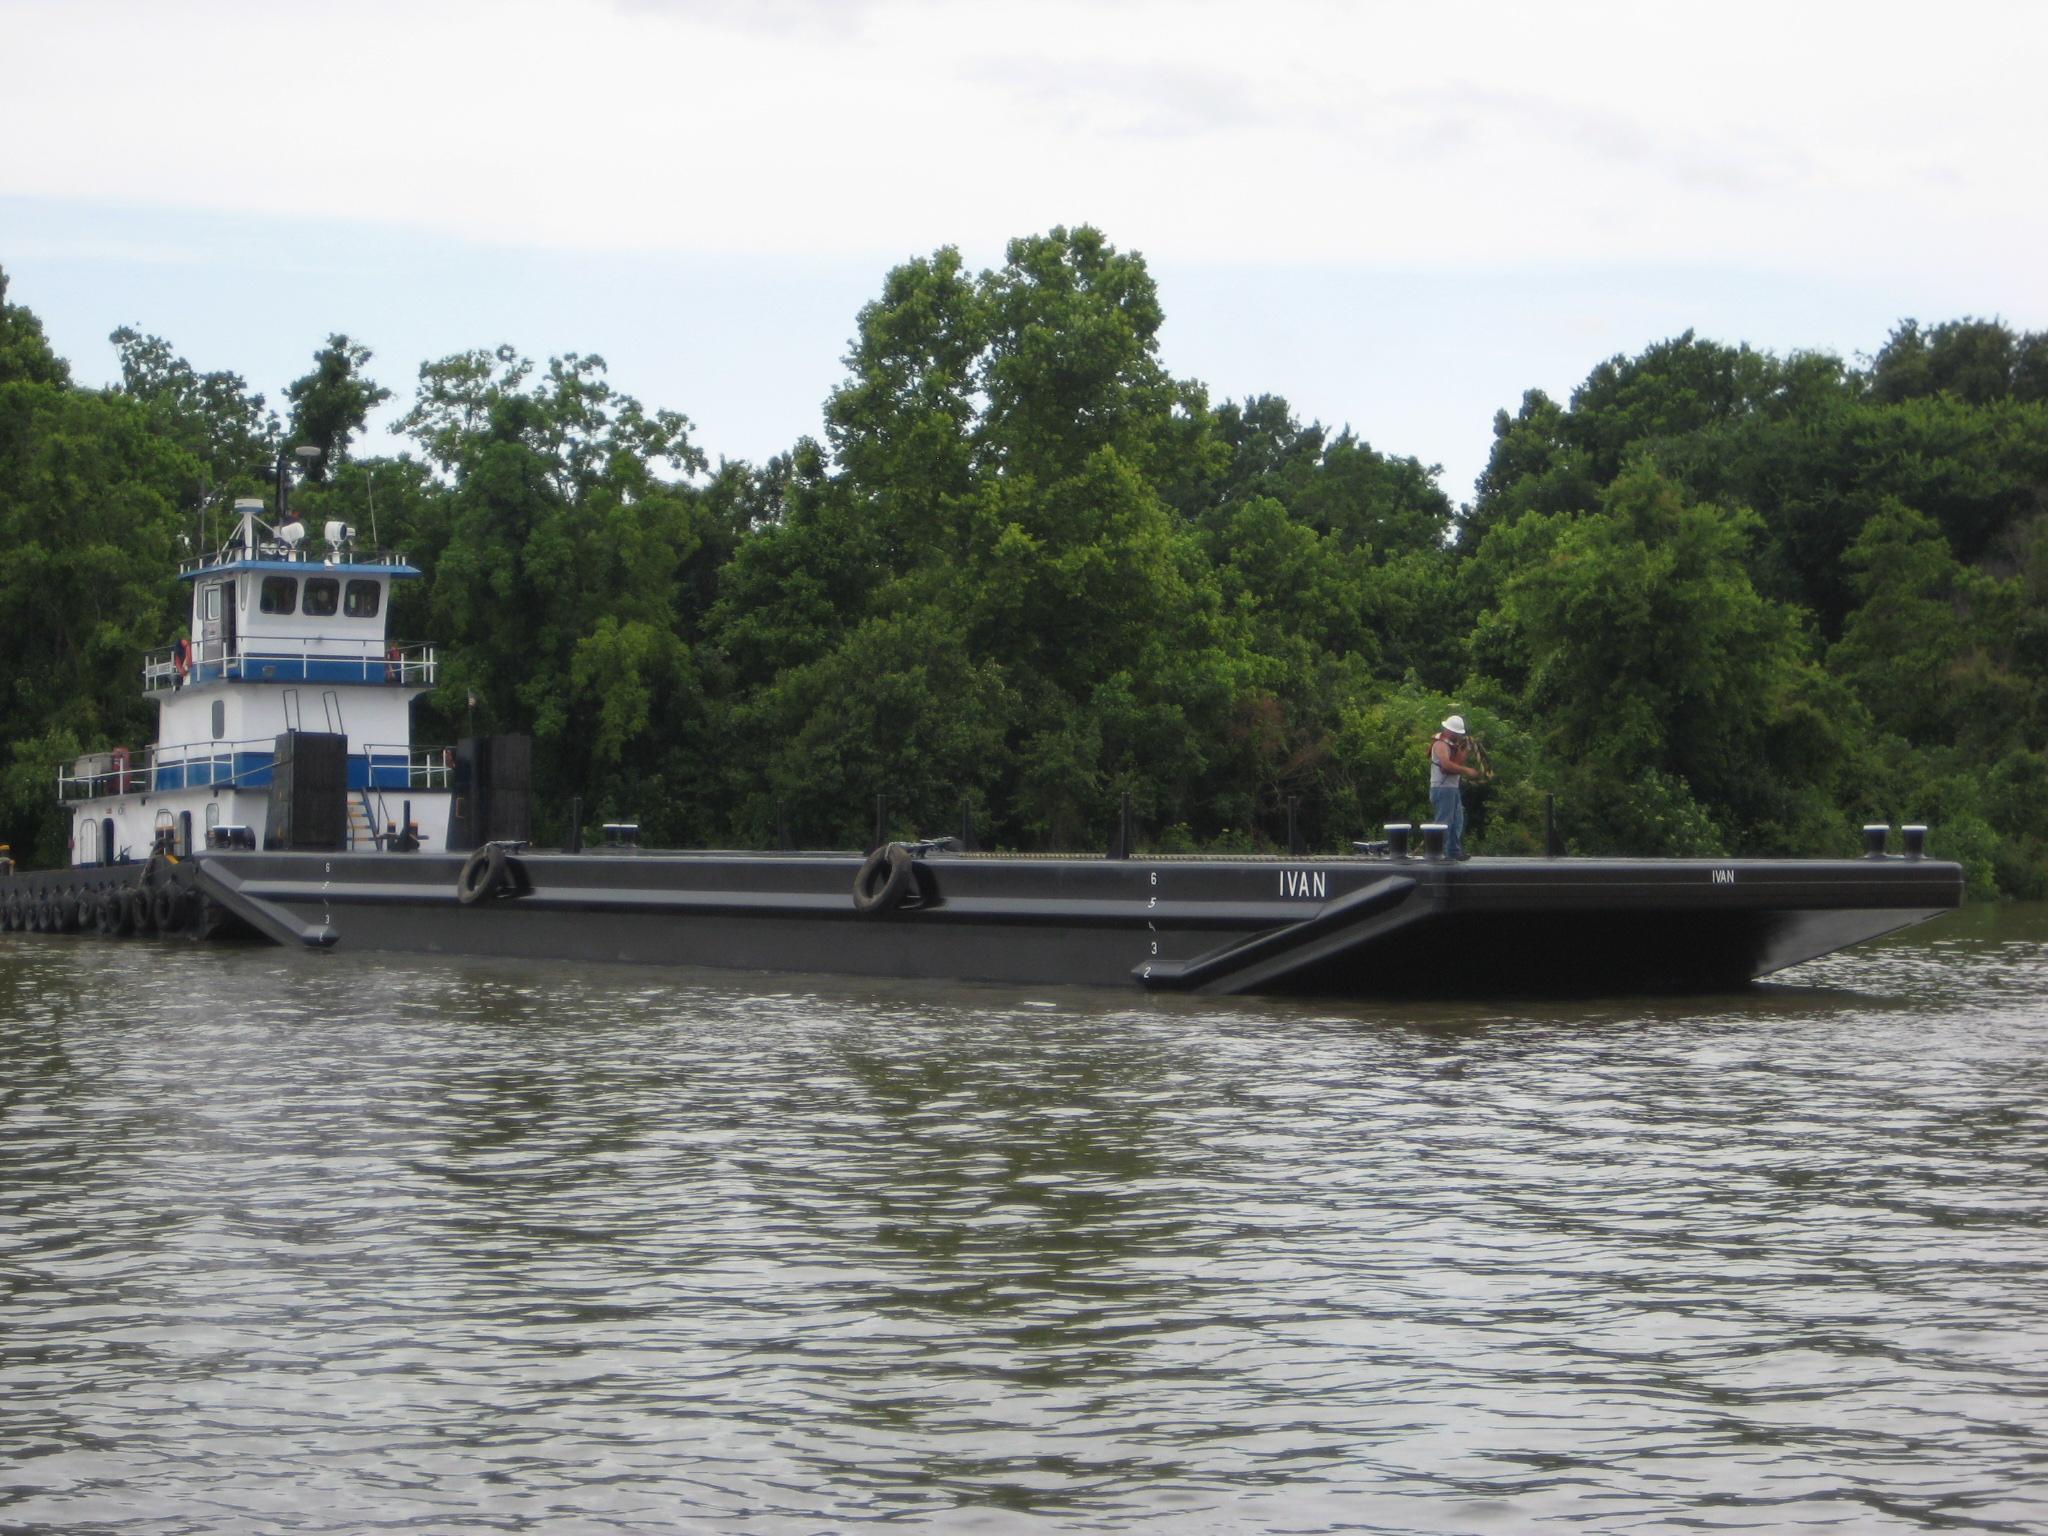 120' x 30' Deck Barge